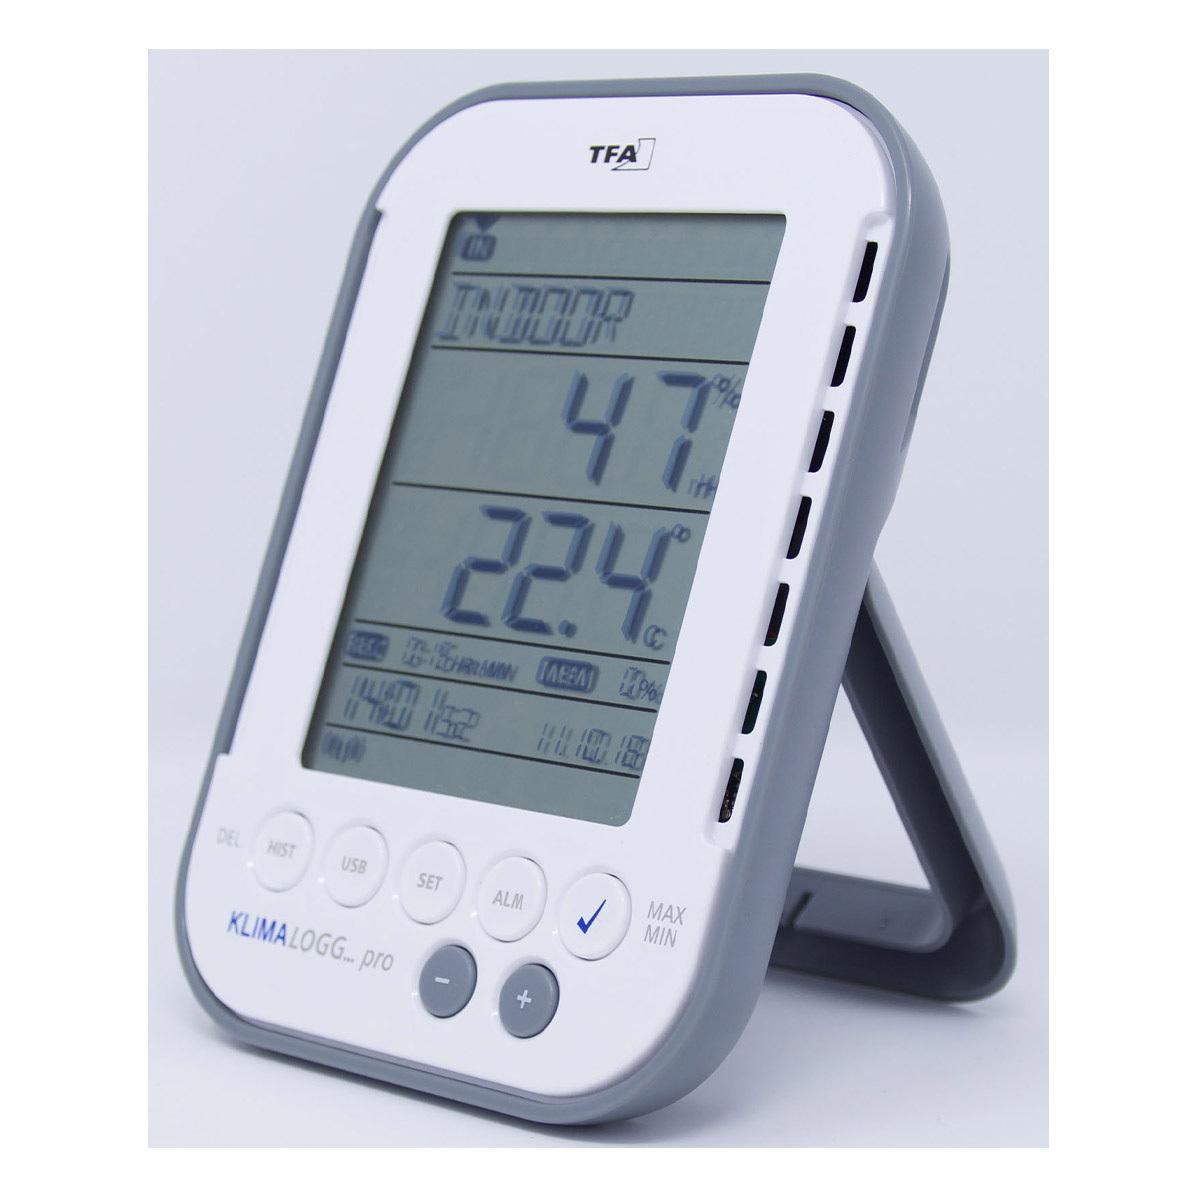 30-3039-it-profi-thermo-hygrometer-mit-datenlogger-funktion-klimalogg-pro-ansicht-1200x1200px.jpg